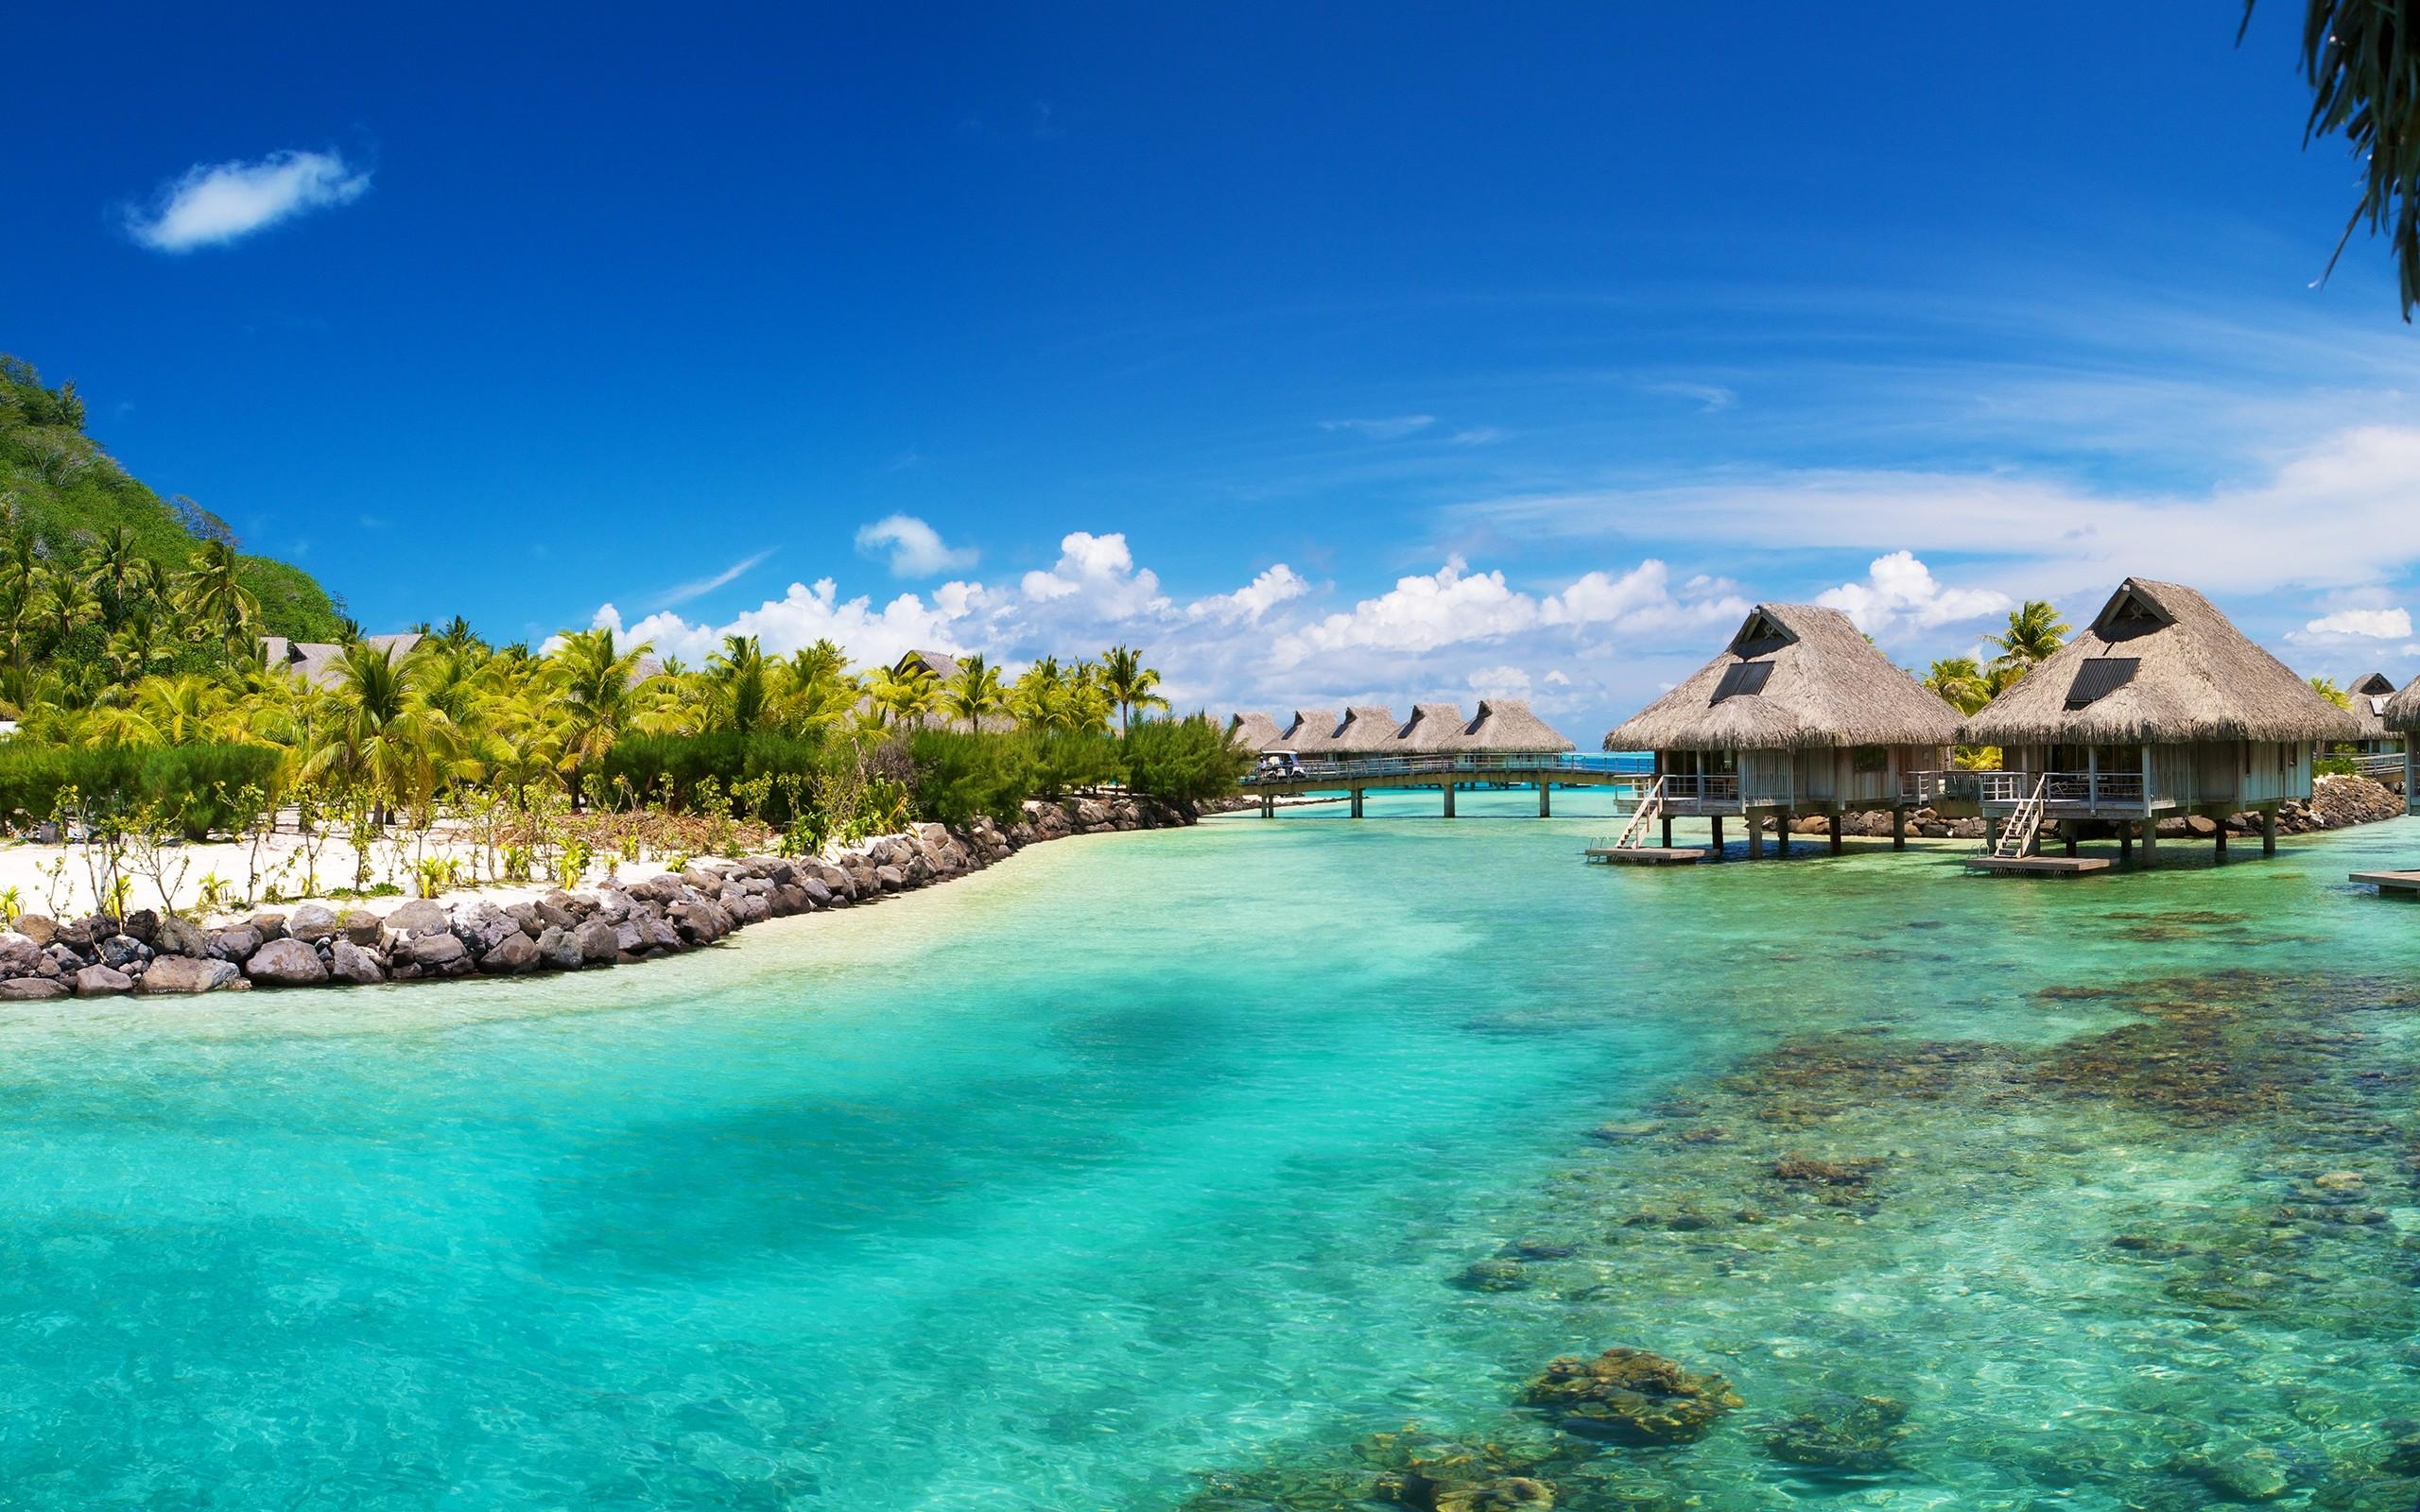 Best 25 Summer Desktop Backgrounds Ideas On Pinterest Bora Bora 1863148 Hd Wallpaper Backgrounds Download